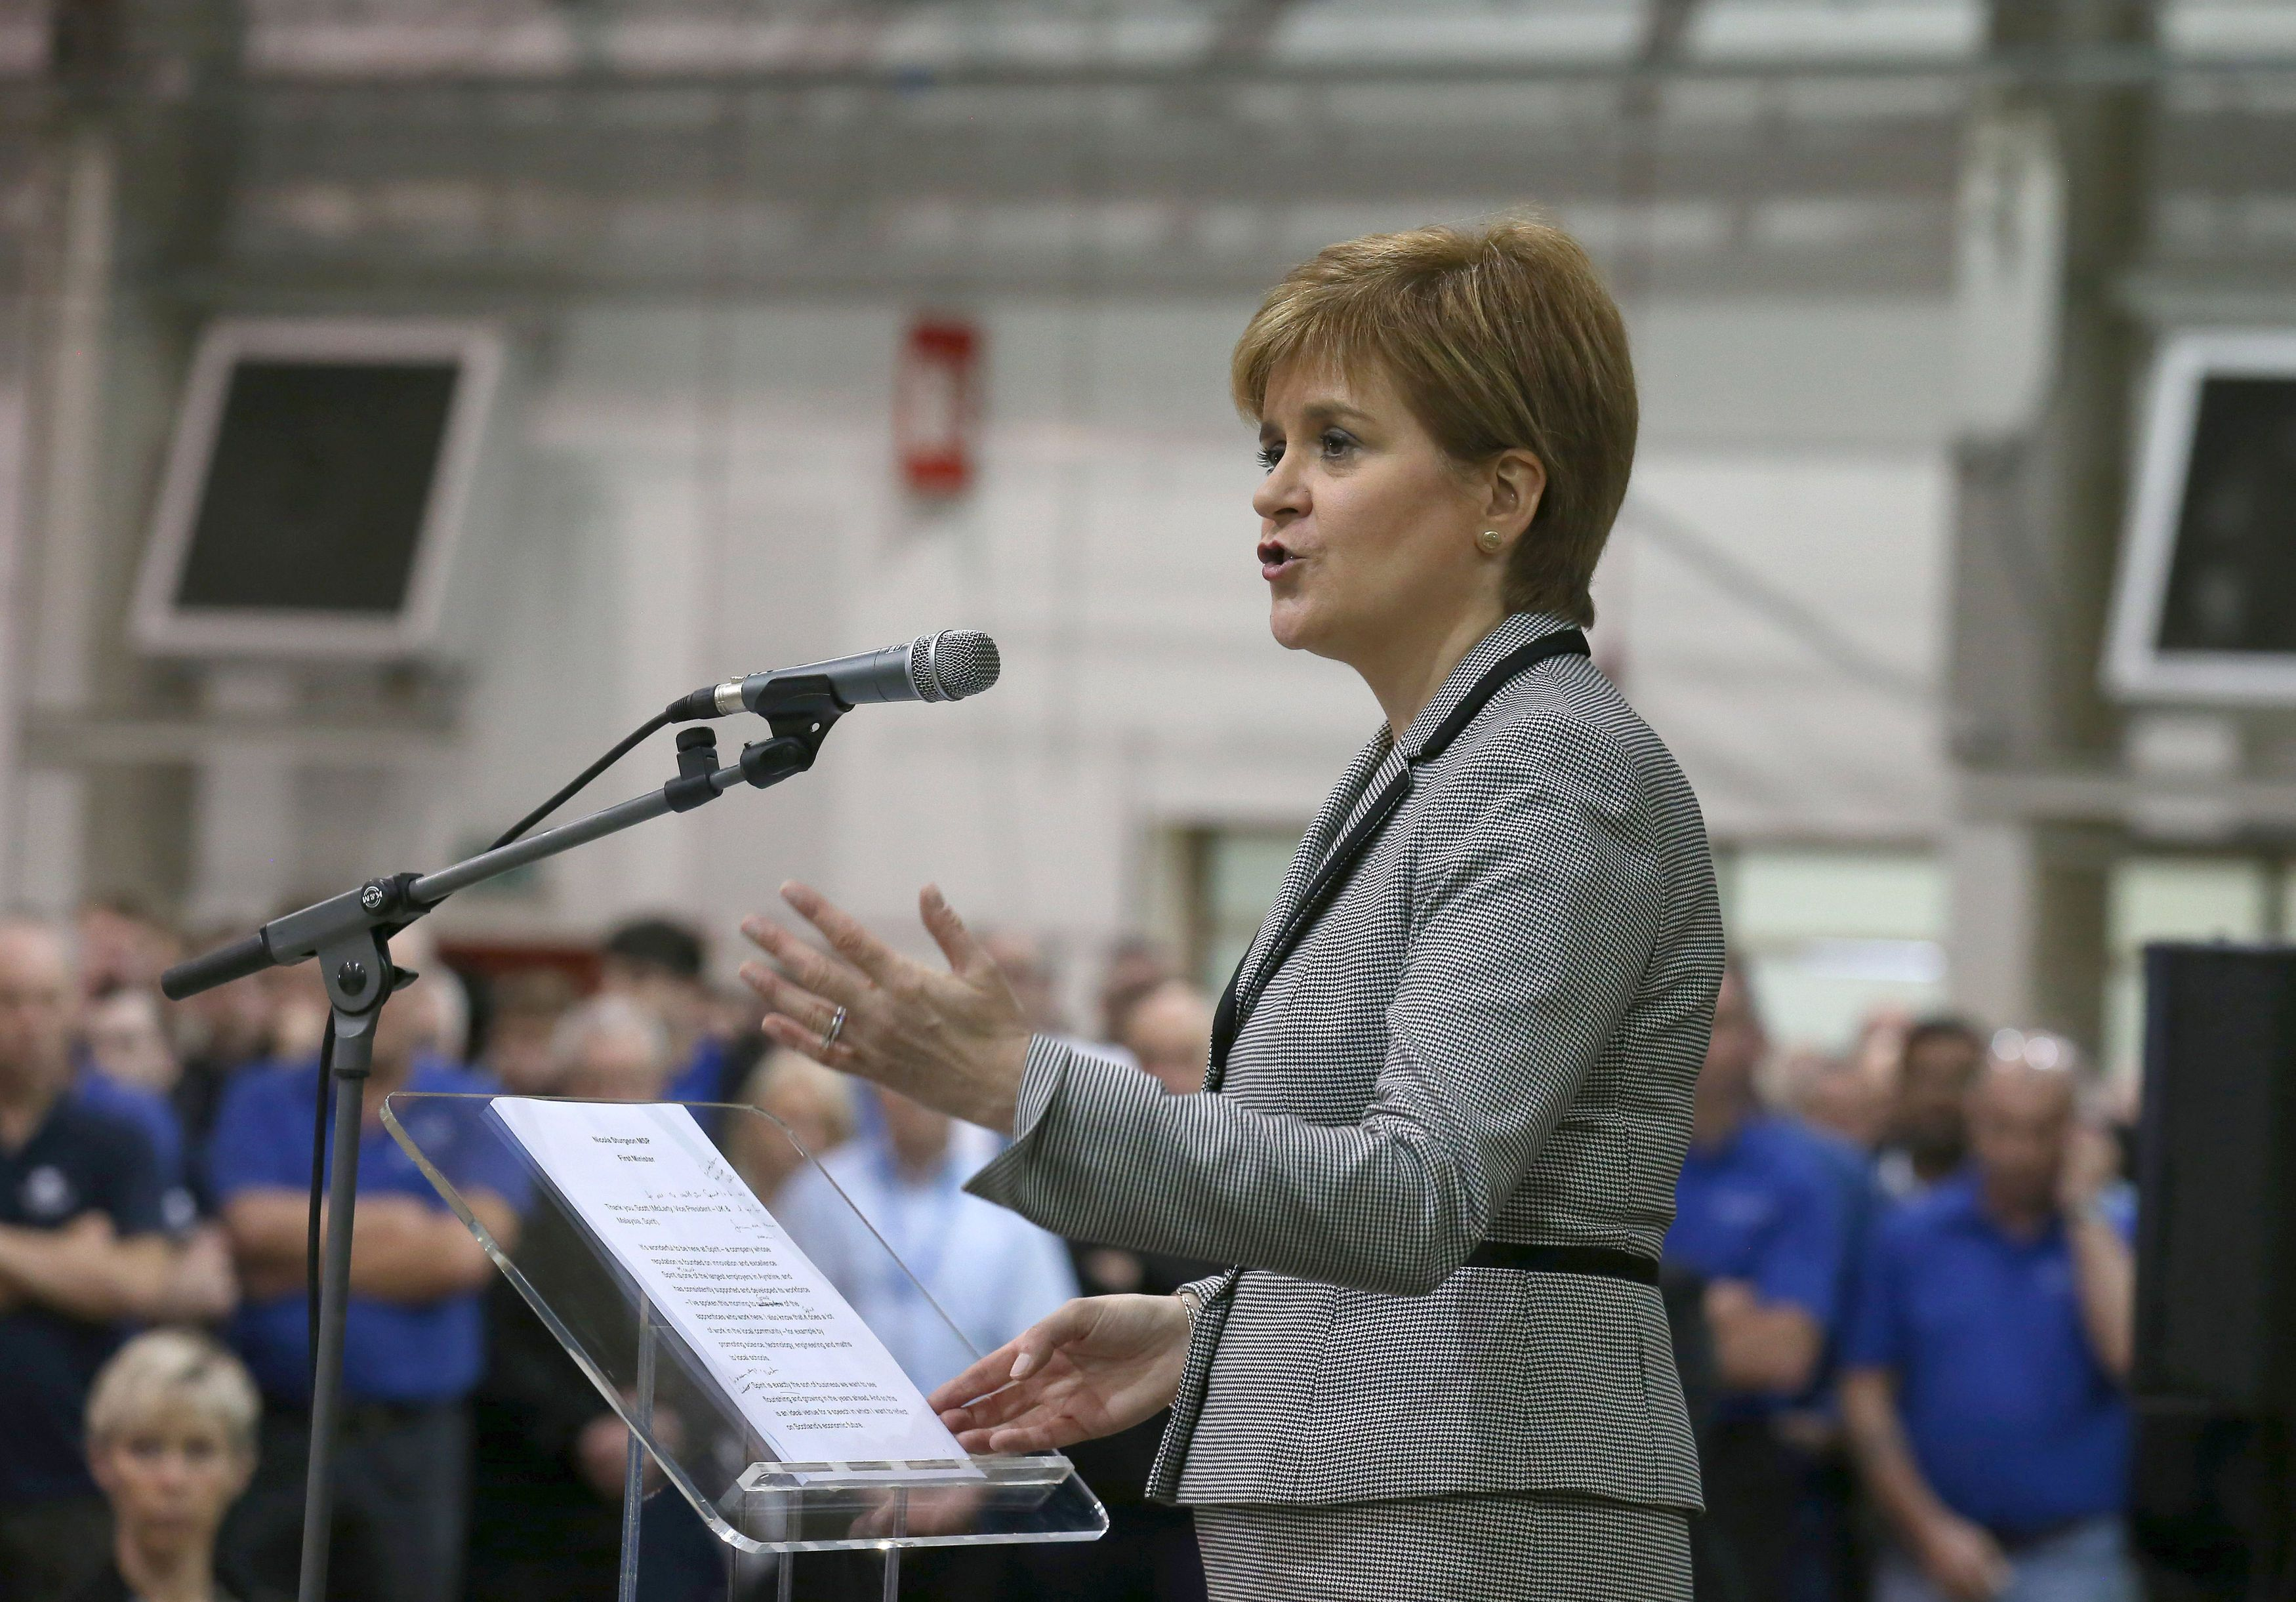 Nicola Sturgeon 'Will Scrap Public Sector Pay Cap' In